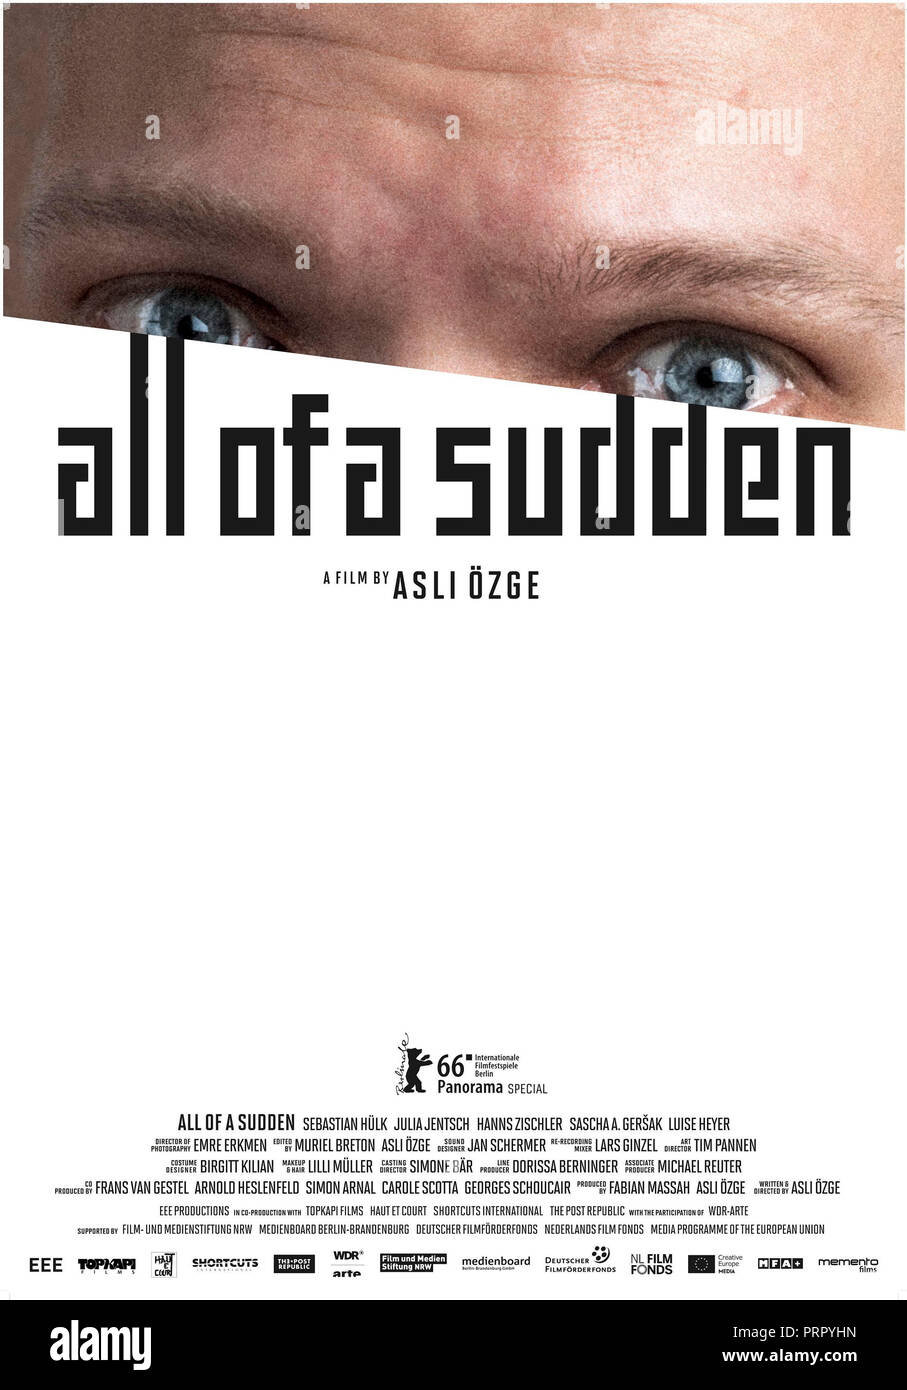 Prod DB ©EEE Productions / DR LENDEMAIN DE FETE (AUF EINMAL) de Asli Ozge 2016 ALL./HOL. affiche internationale - Stock Image